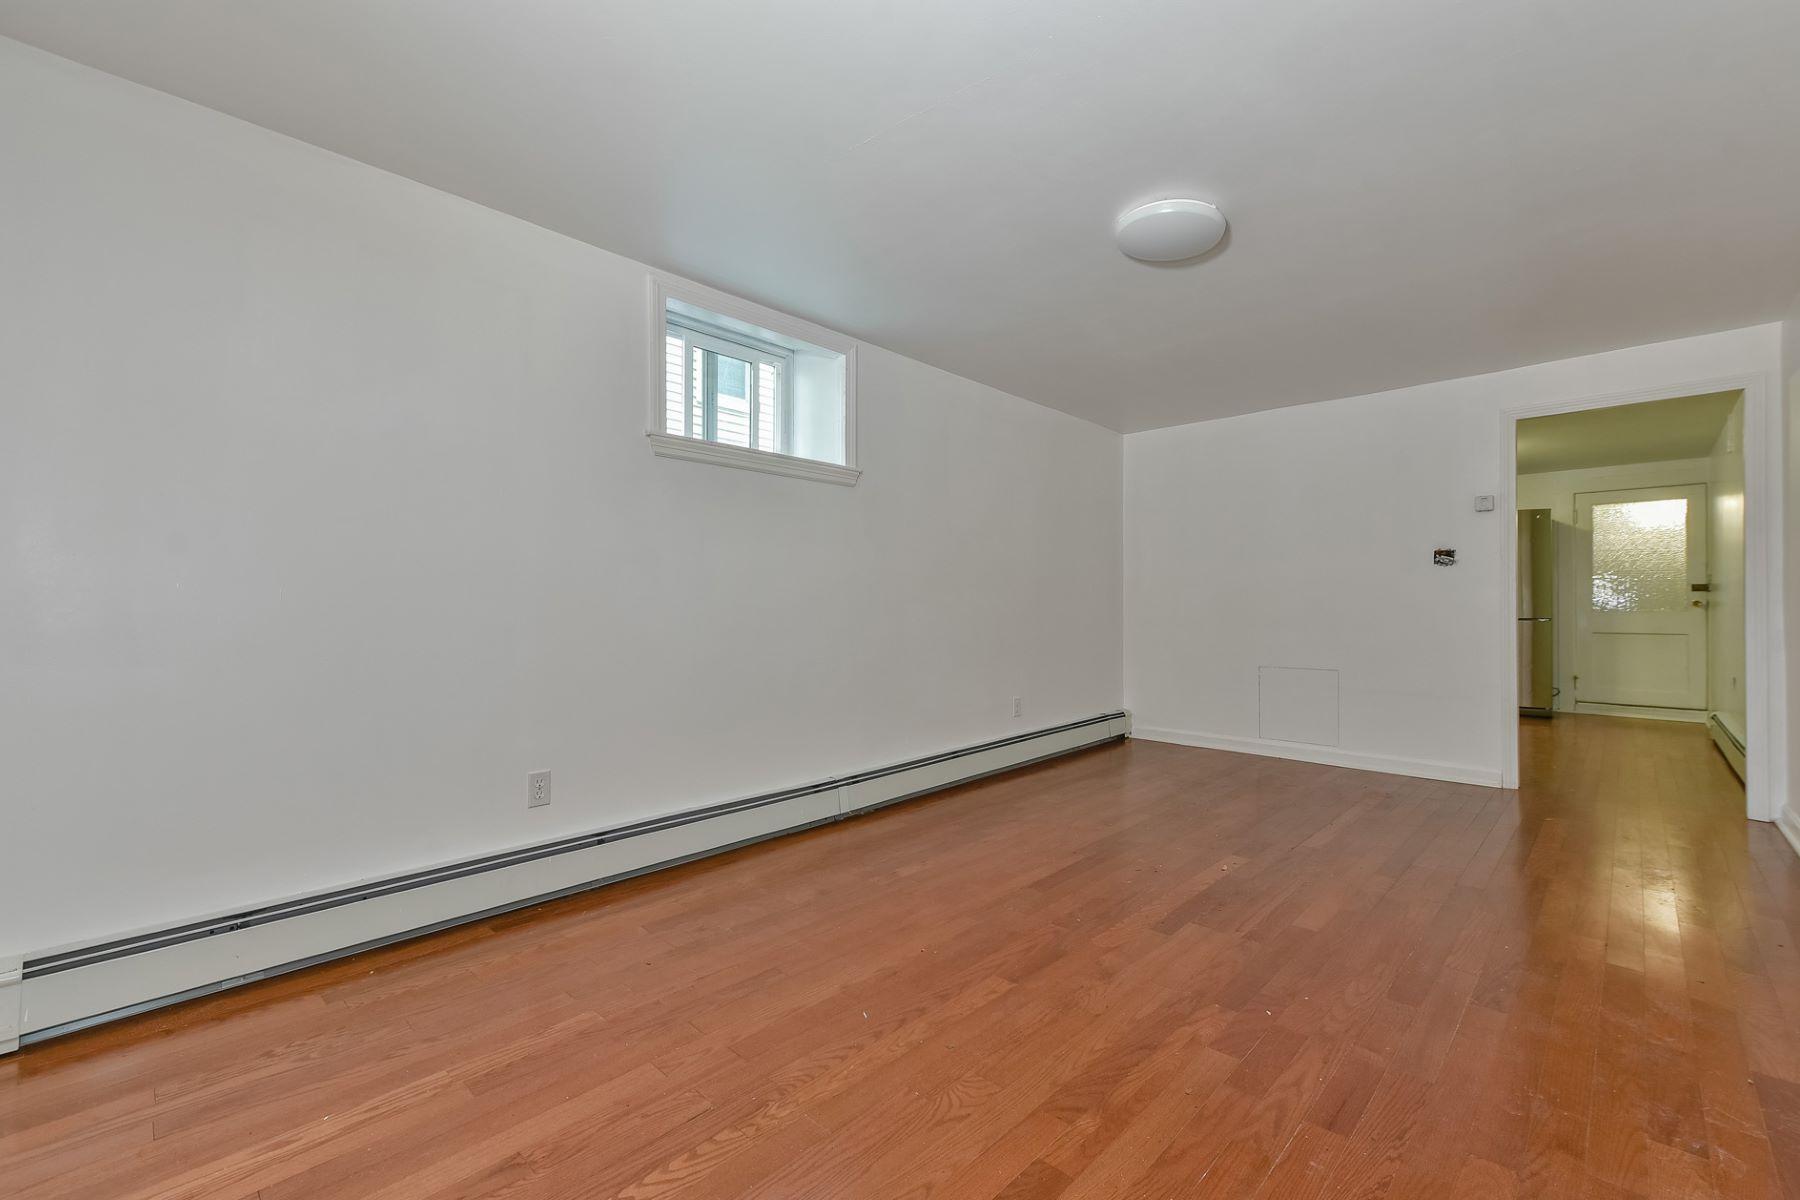 Additional photo for property listing at 10 Dent B, Boston  Boston, Massachusetts 02132 United States